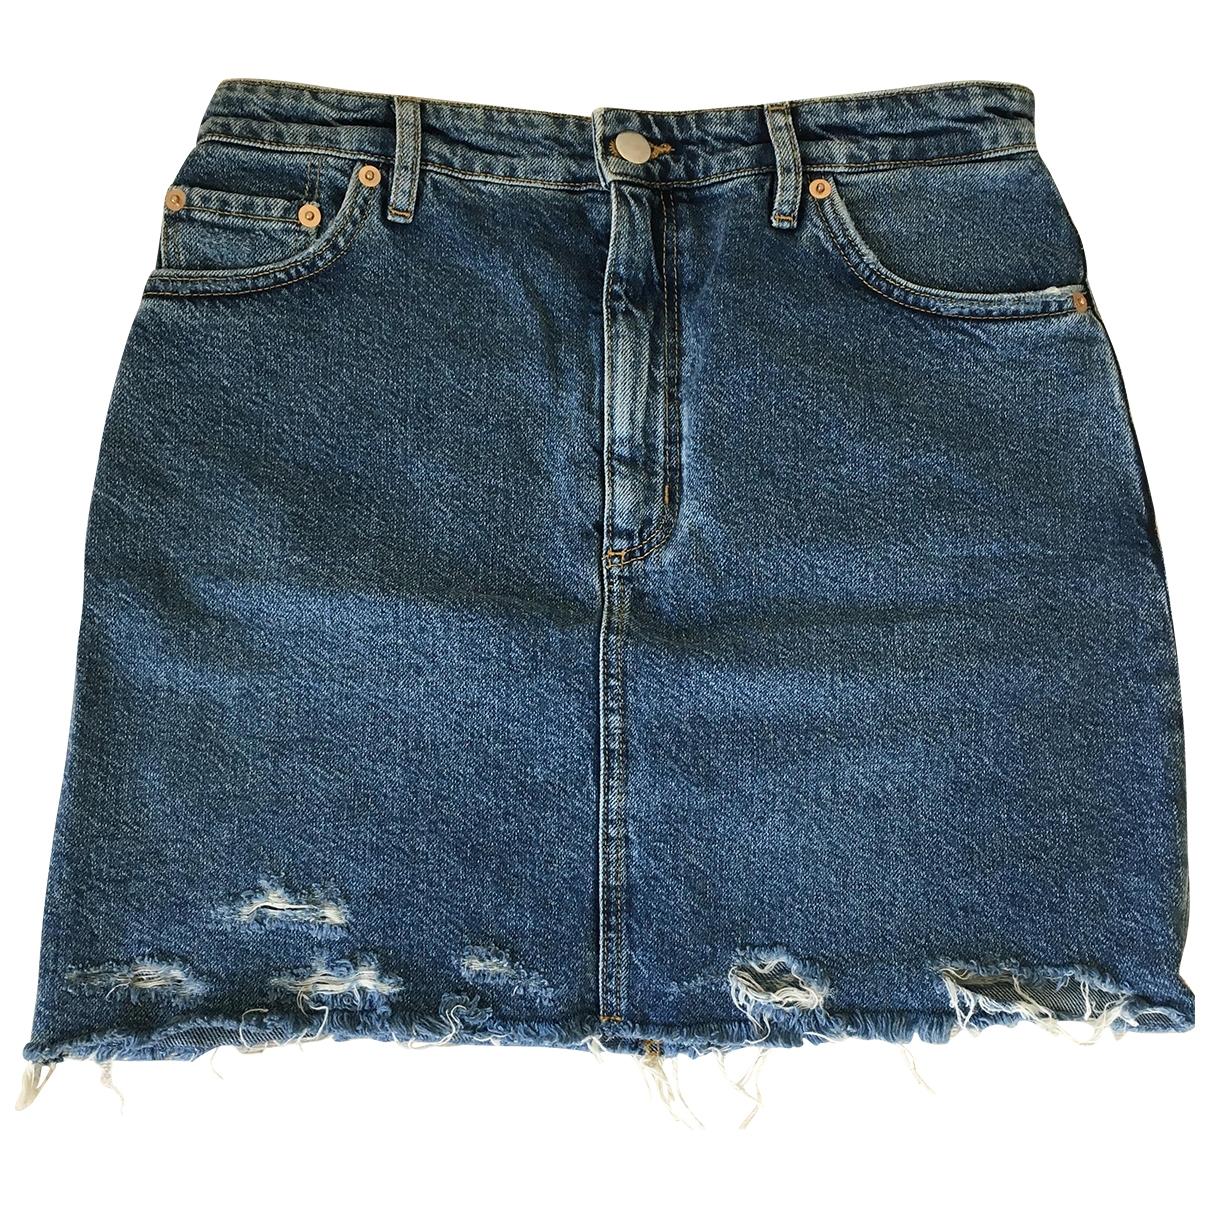 & Other Stories \N Rocke in  Blau Denim - Jeans